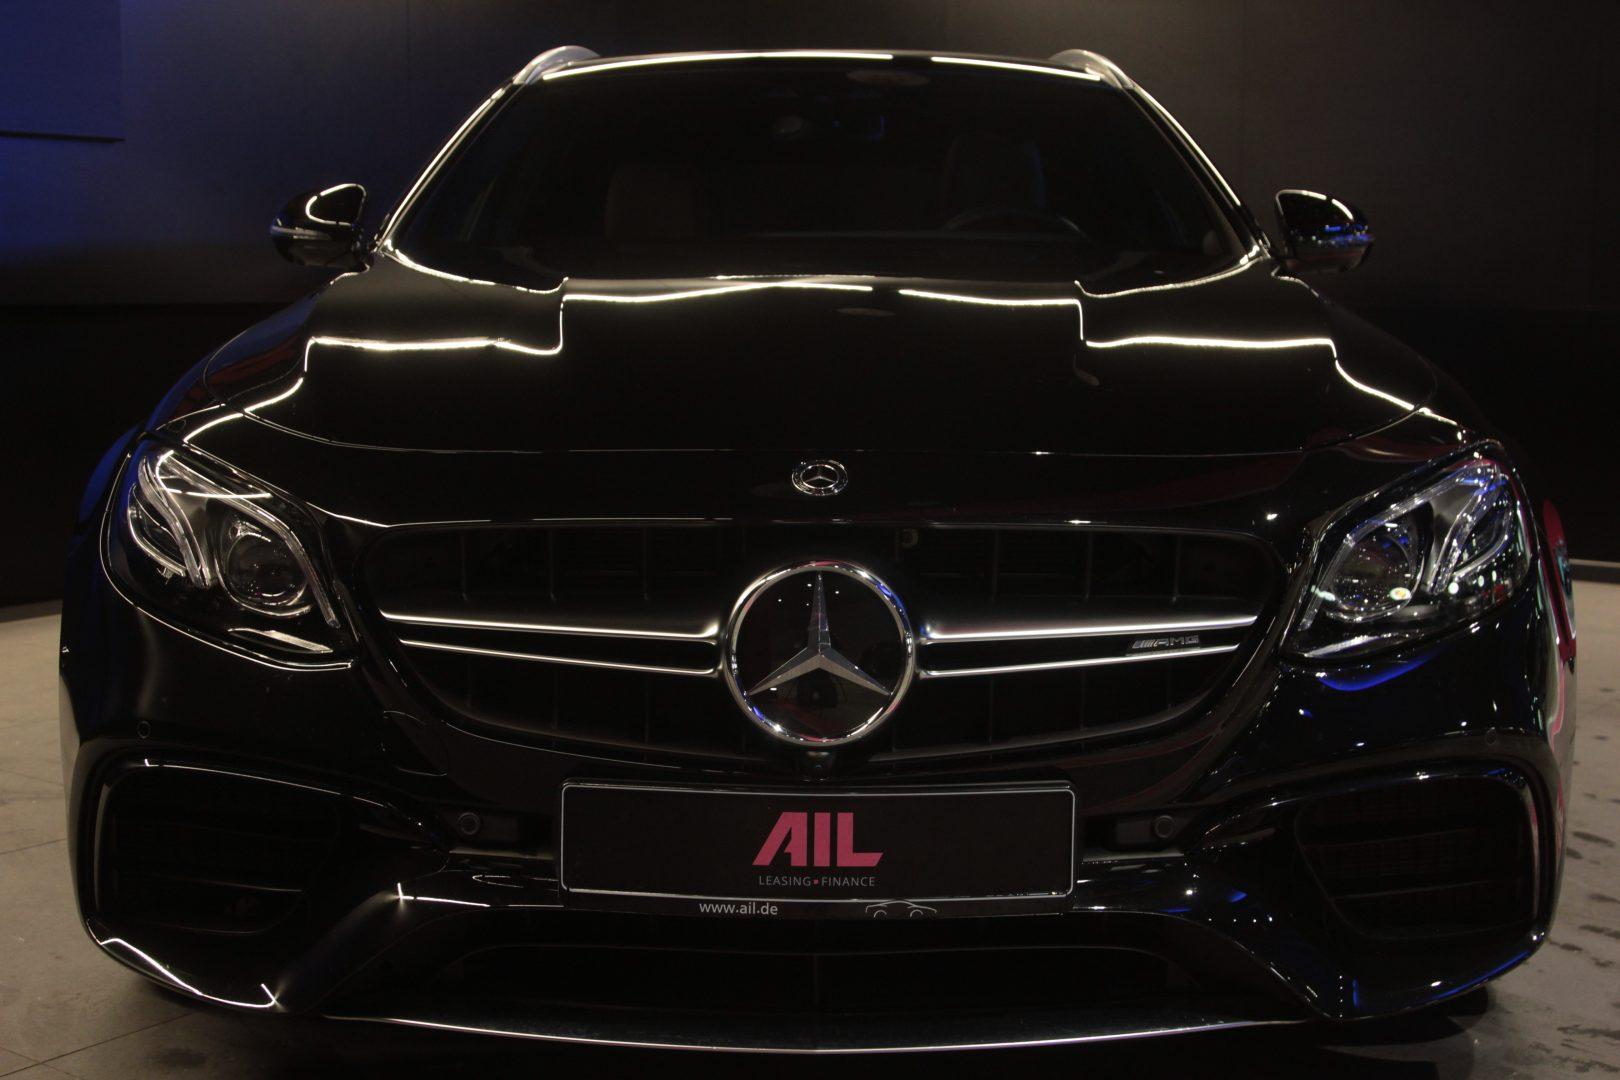 AIL Mercedes-Benz  E 63 AMG S 4Matic 5